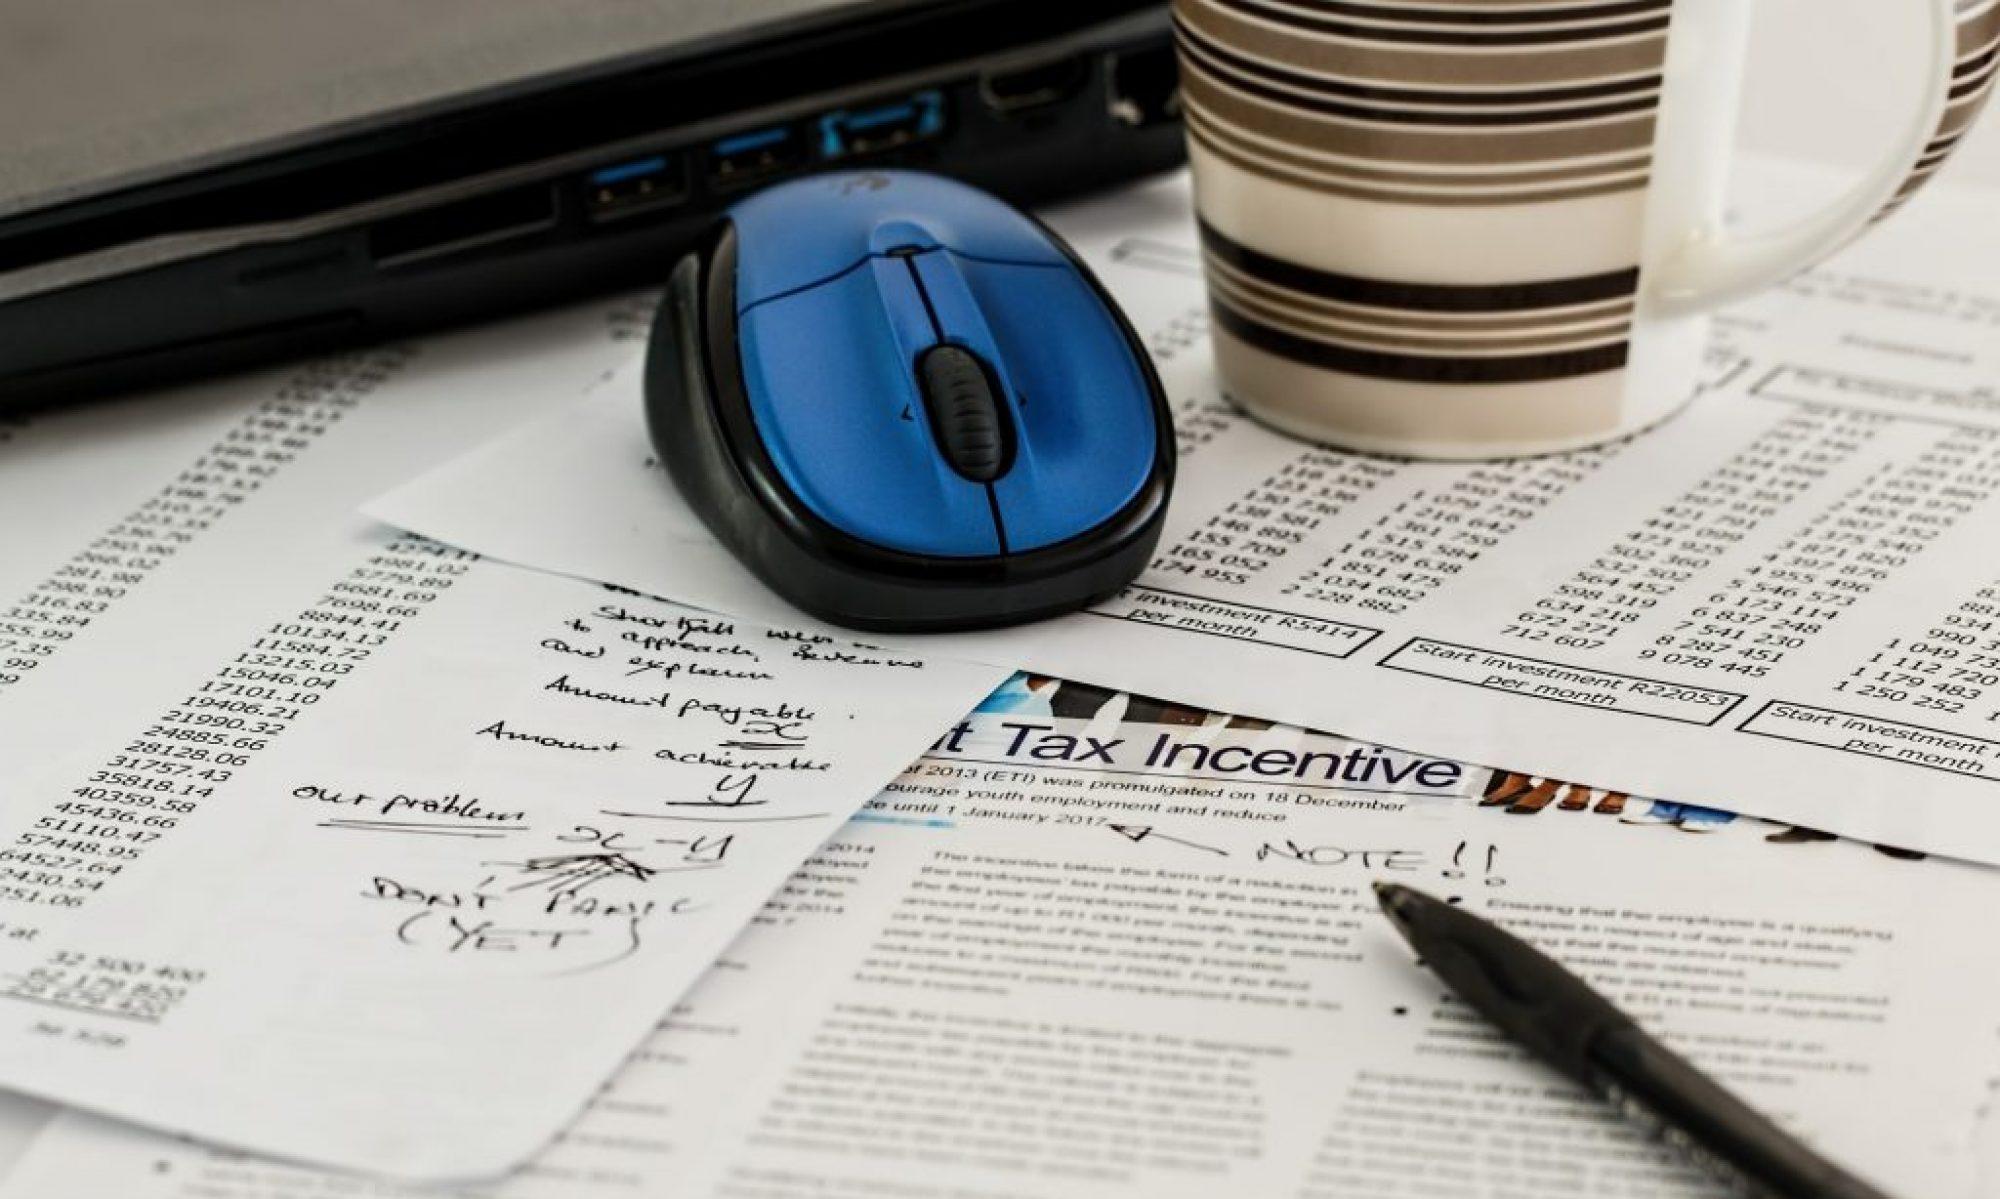 PKO Tax Provider